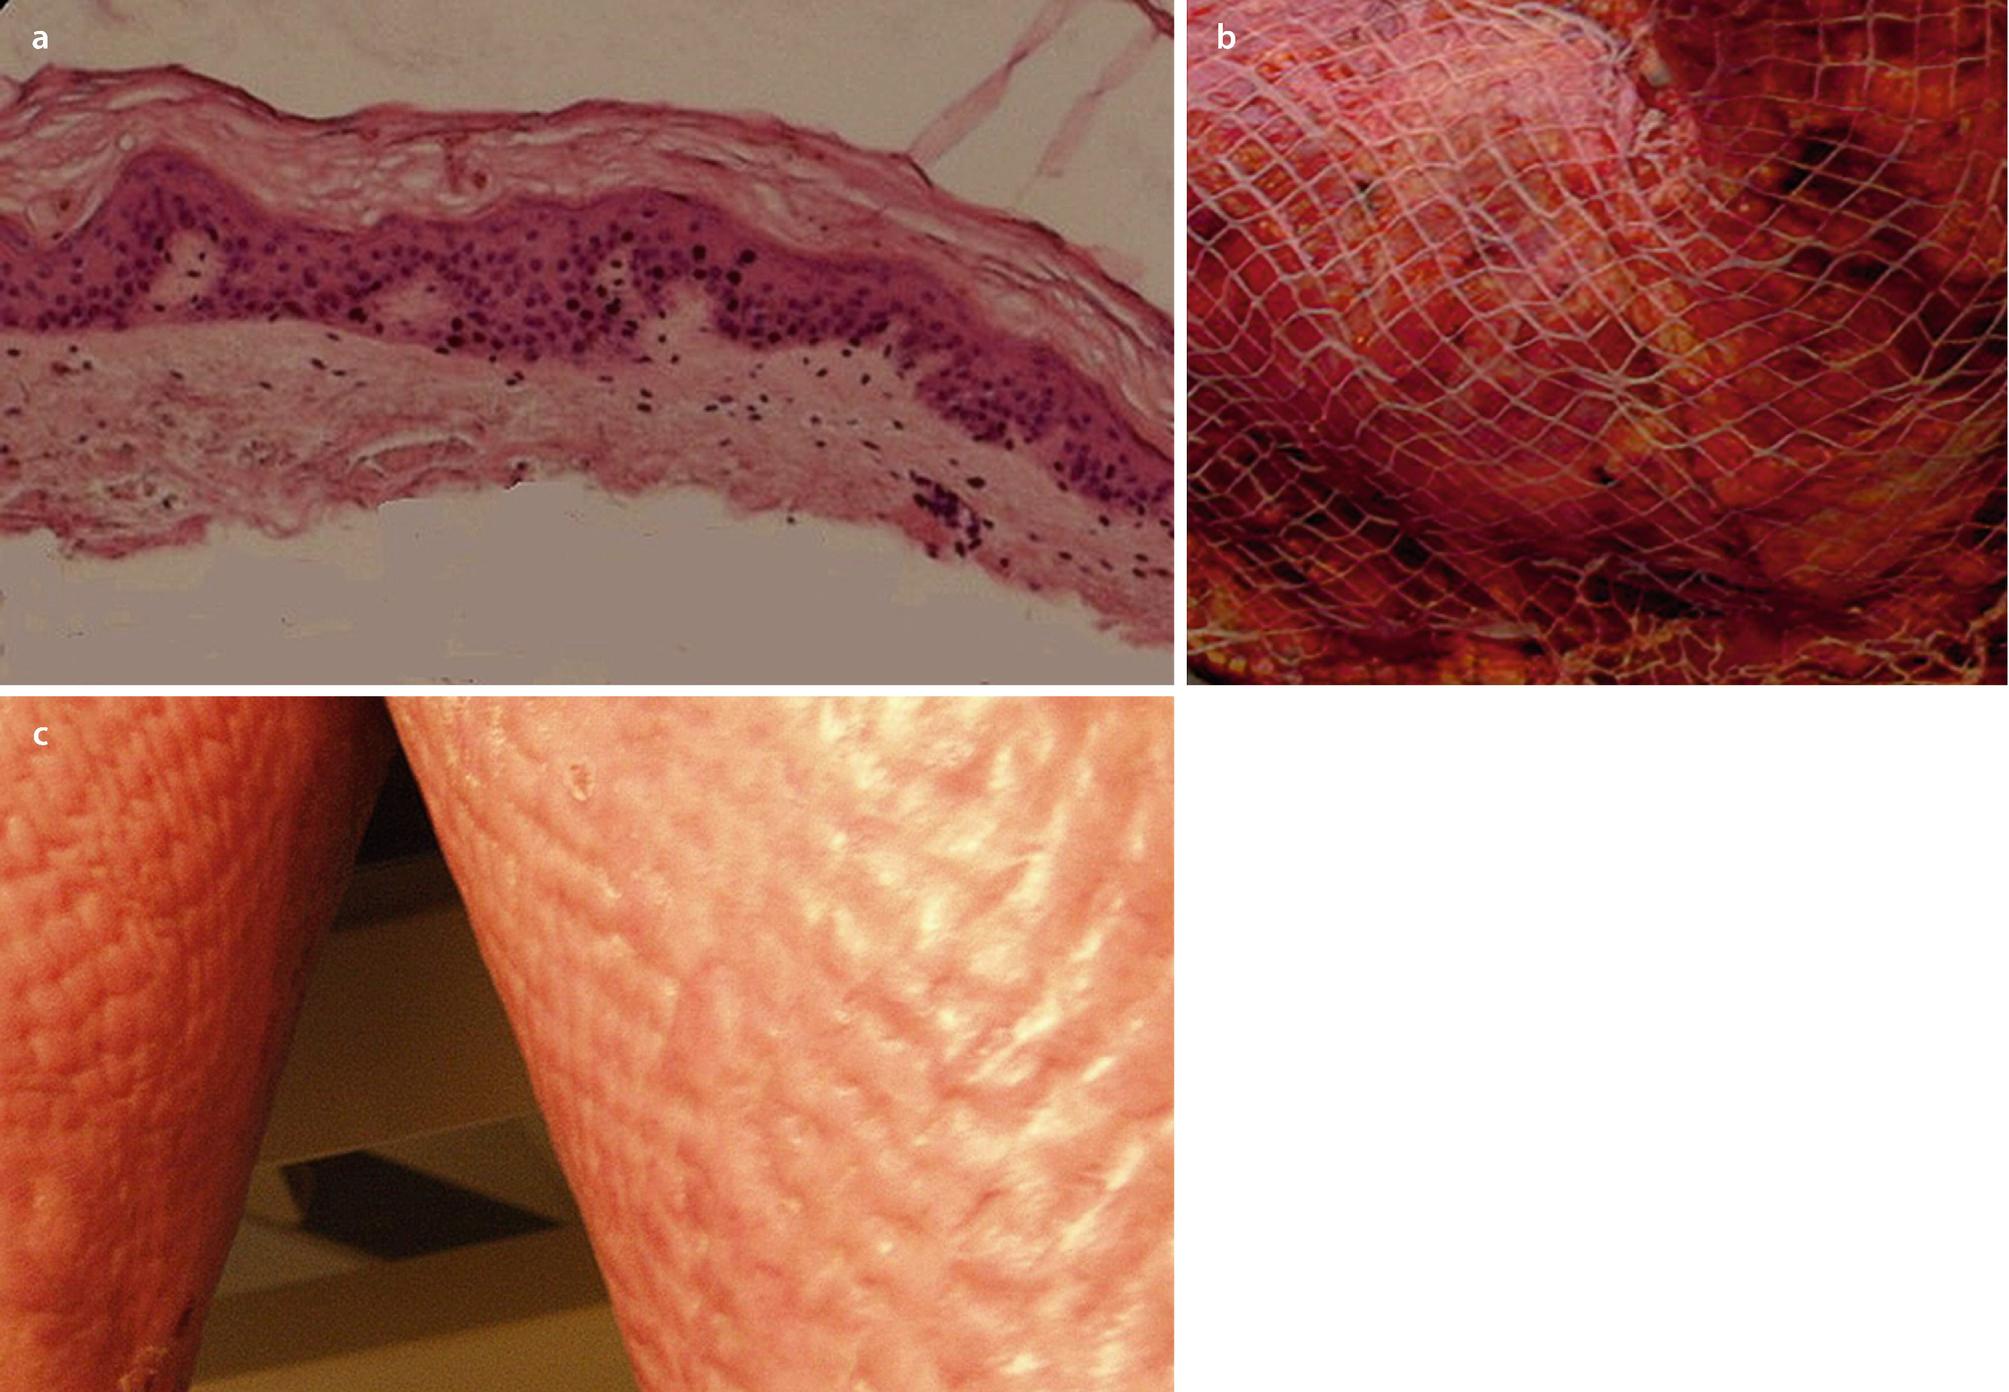 Invasive Techniques In Scar Management Skin Substitutes Springerlink